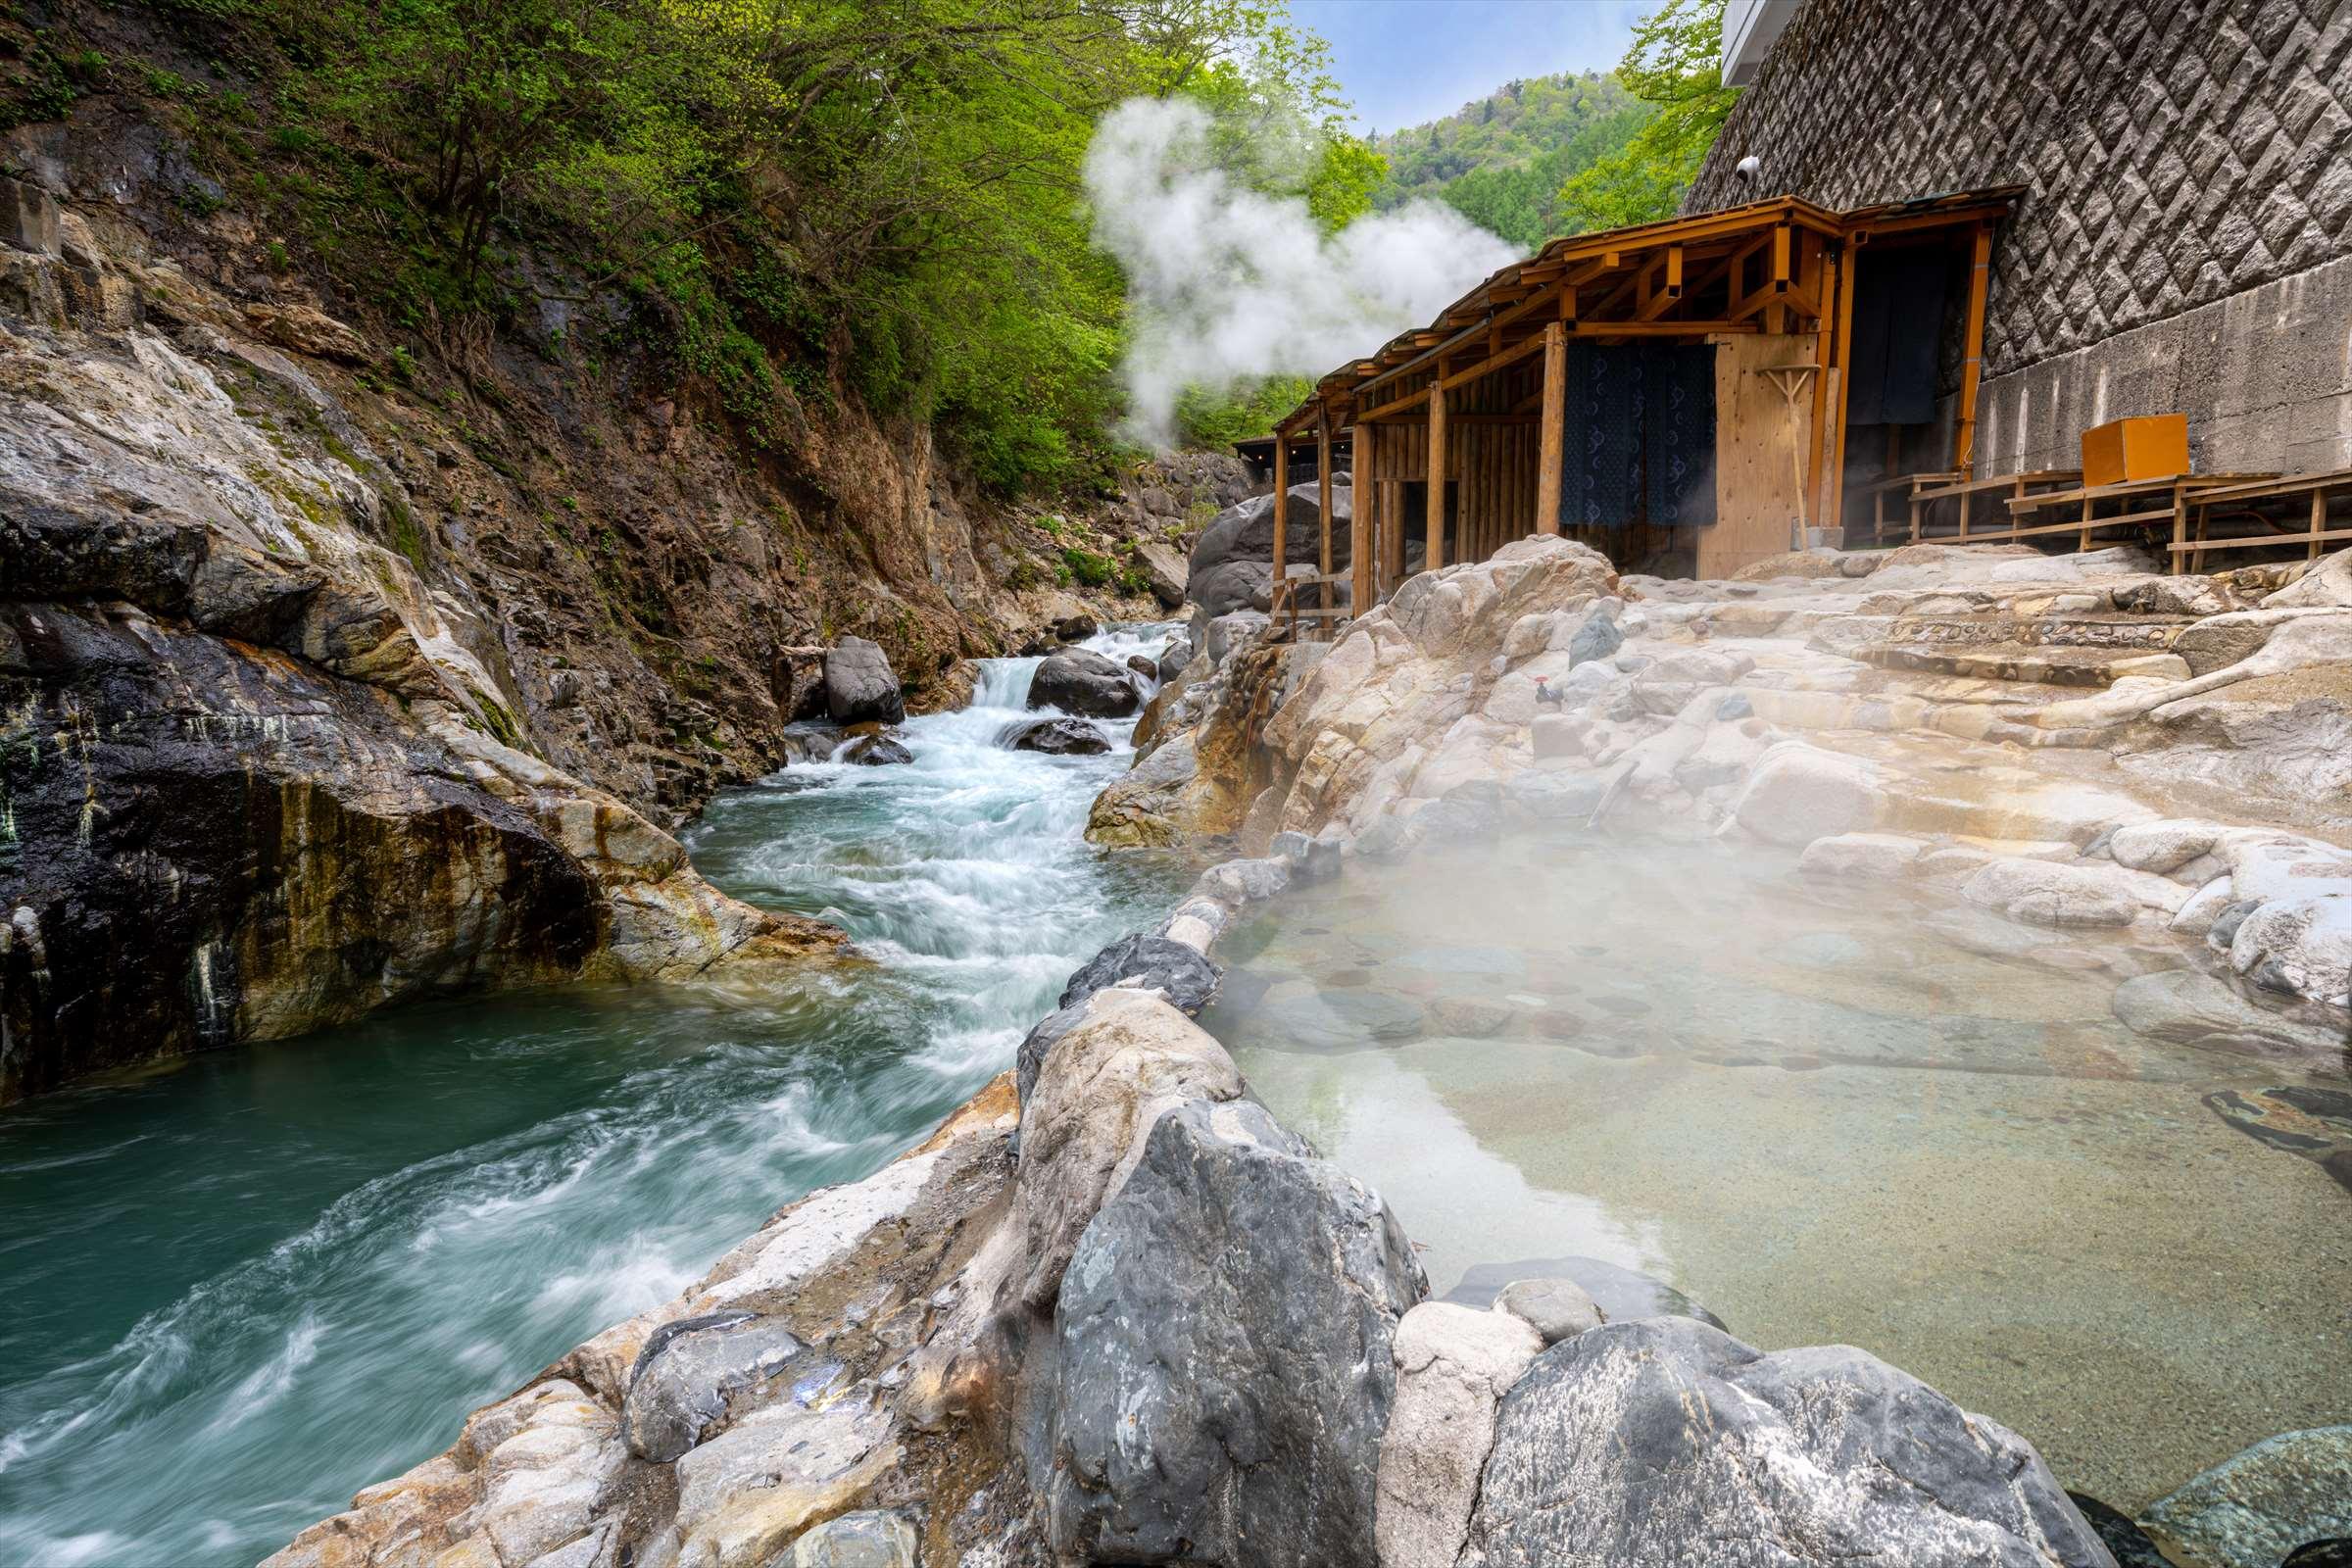 hot spring in a kura